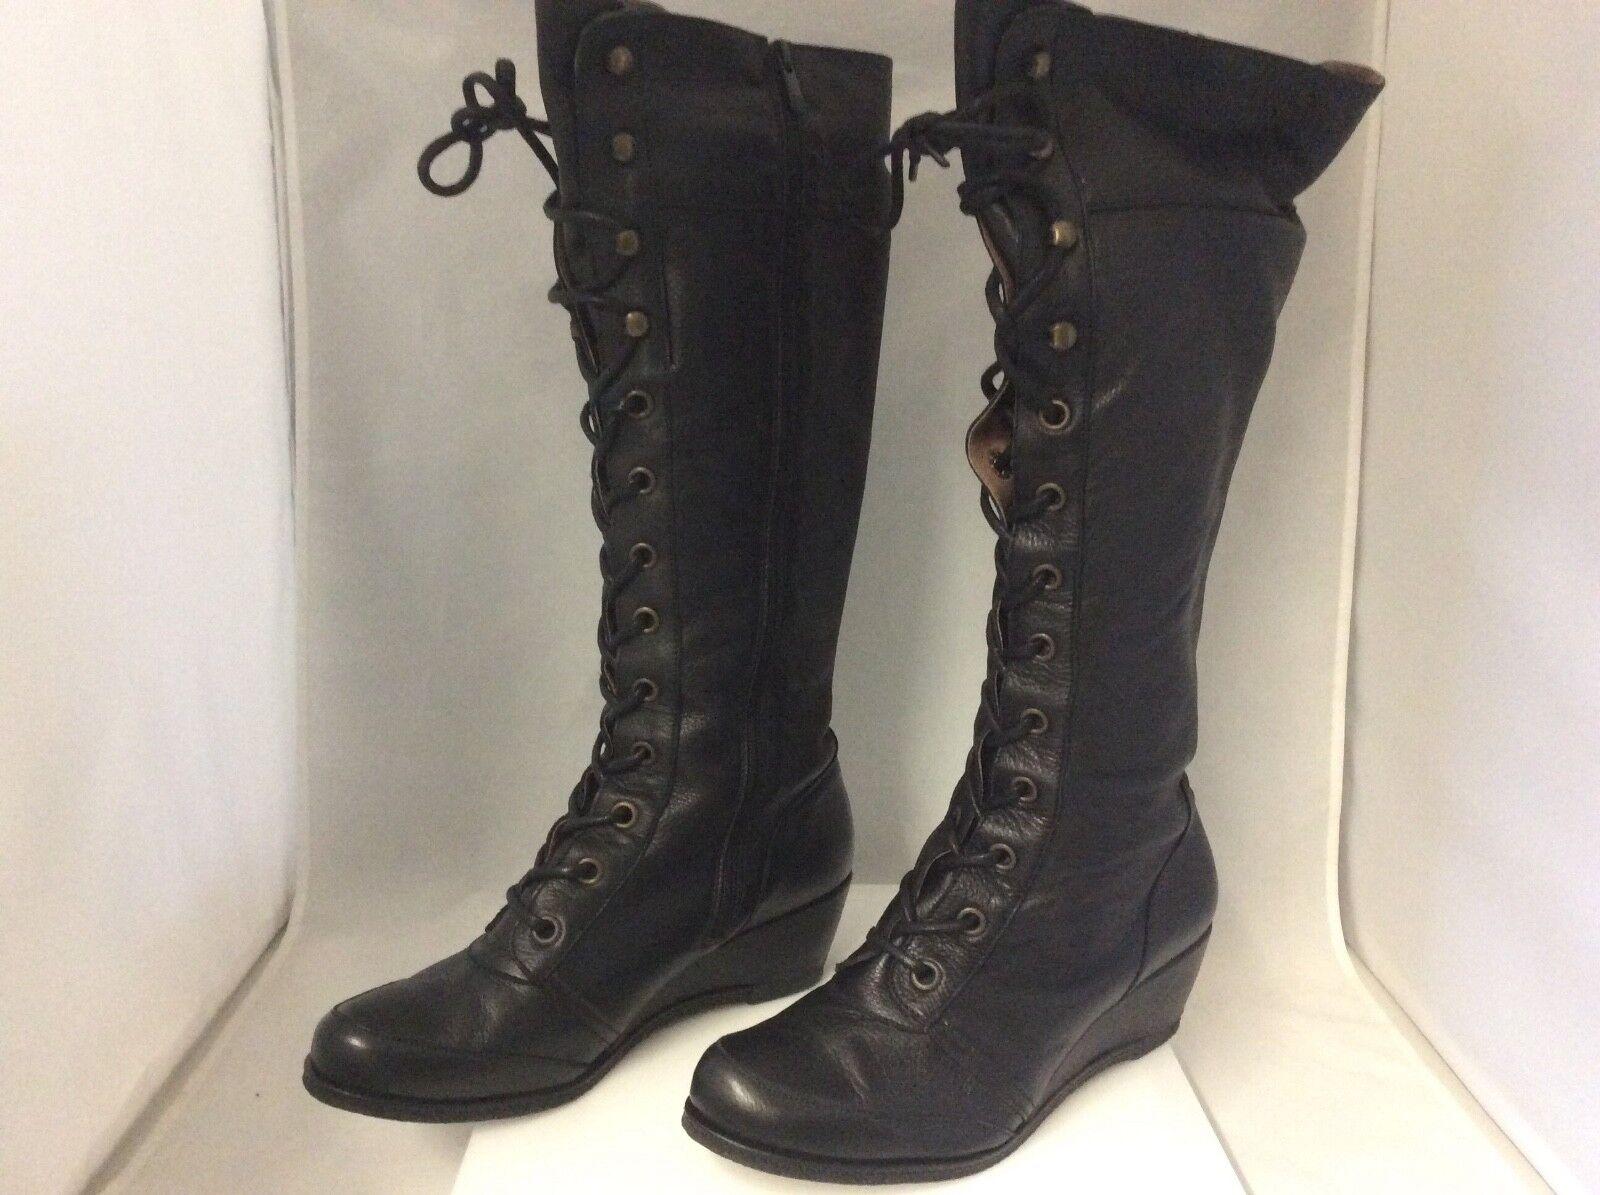 Eric Michael Madrid Leather Black Belinda Knee High Boot NIB Authentic